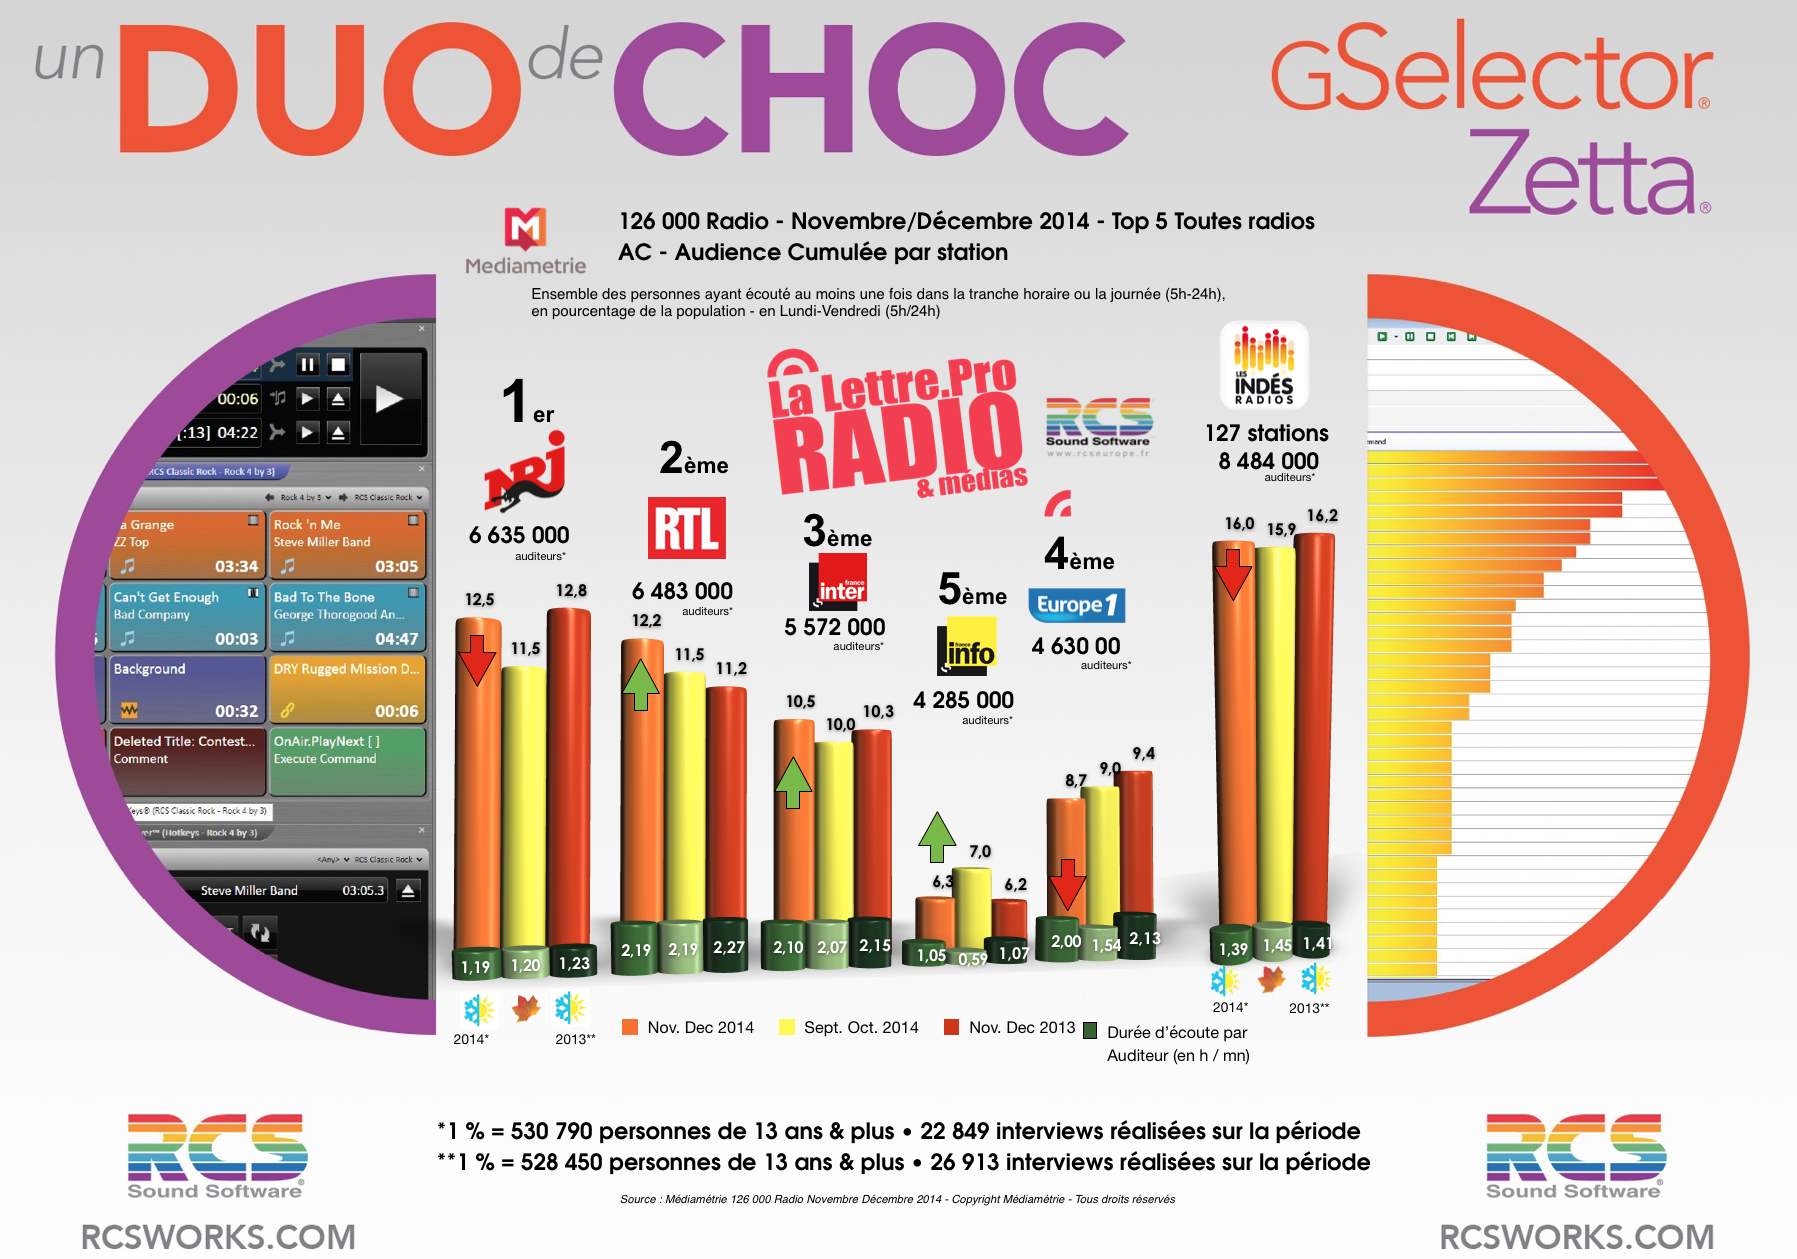 TOP 5 toutes radios - Diagramme exclusif LLP/RCS GSelector-Zetta - Novembre/Décembre 2014